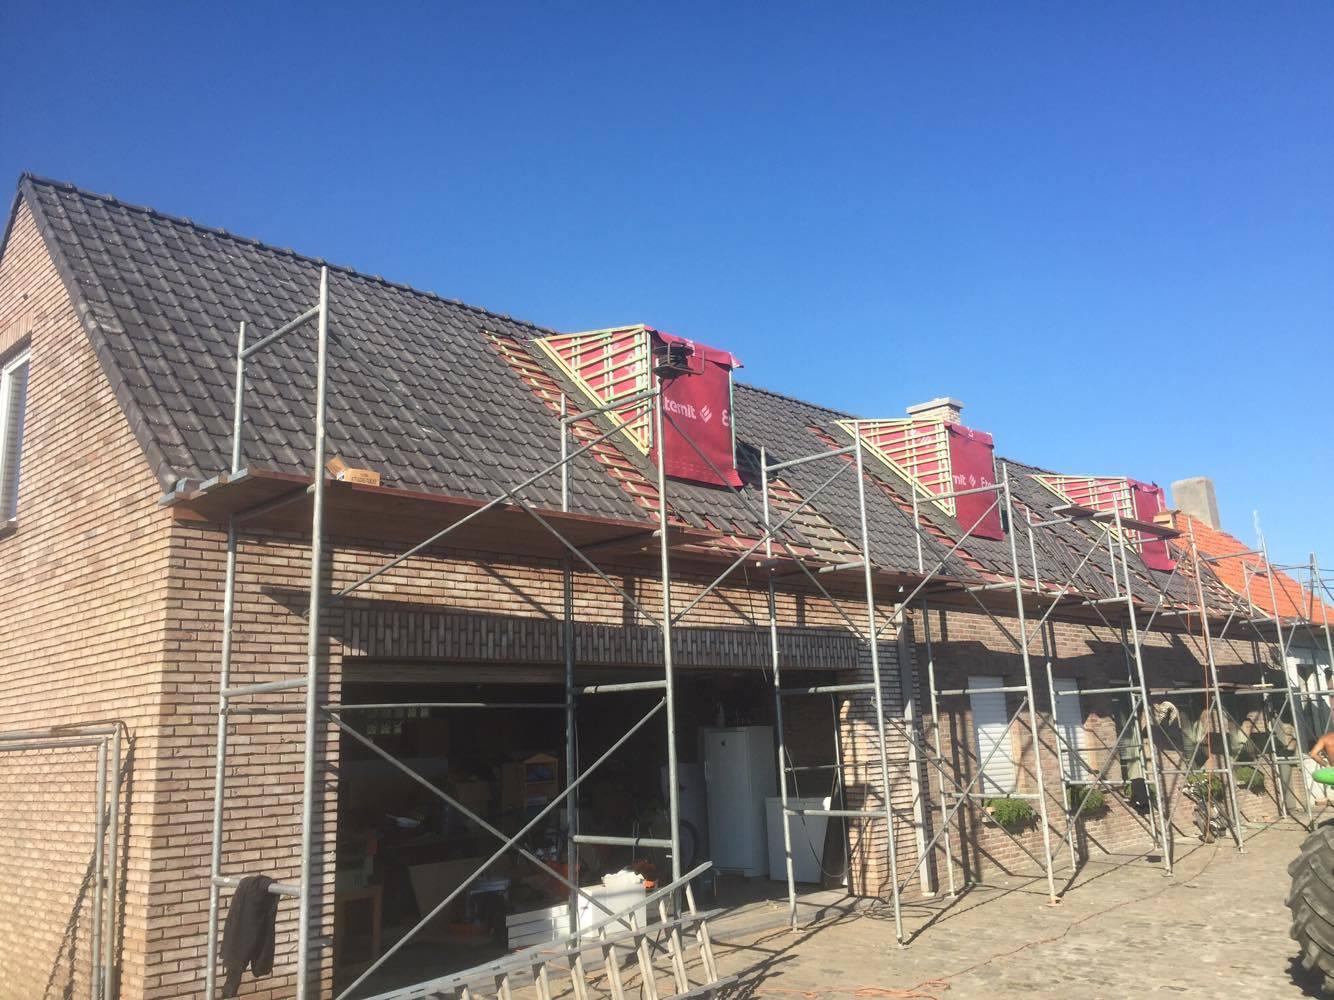 Dak nieuwbouw Roeselare.jpg